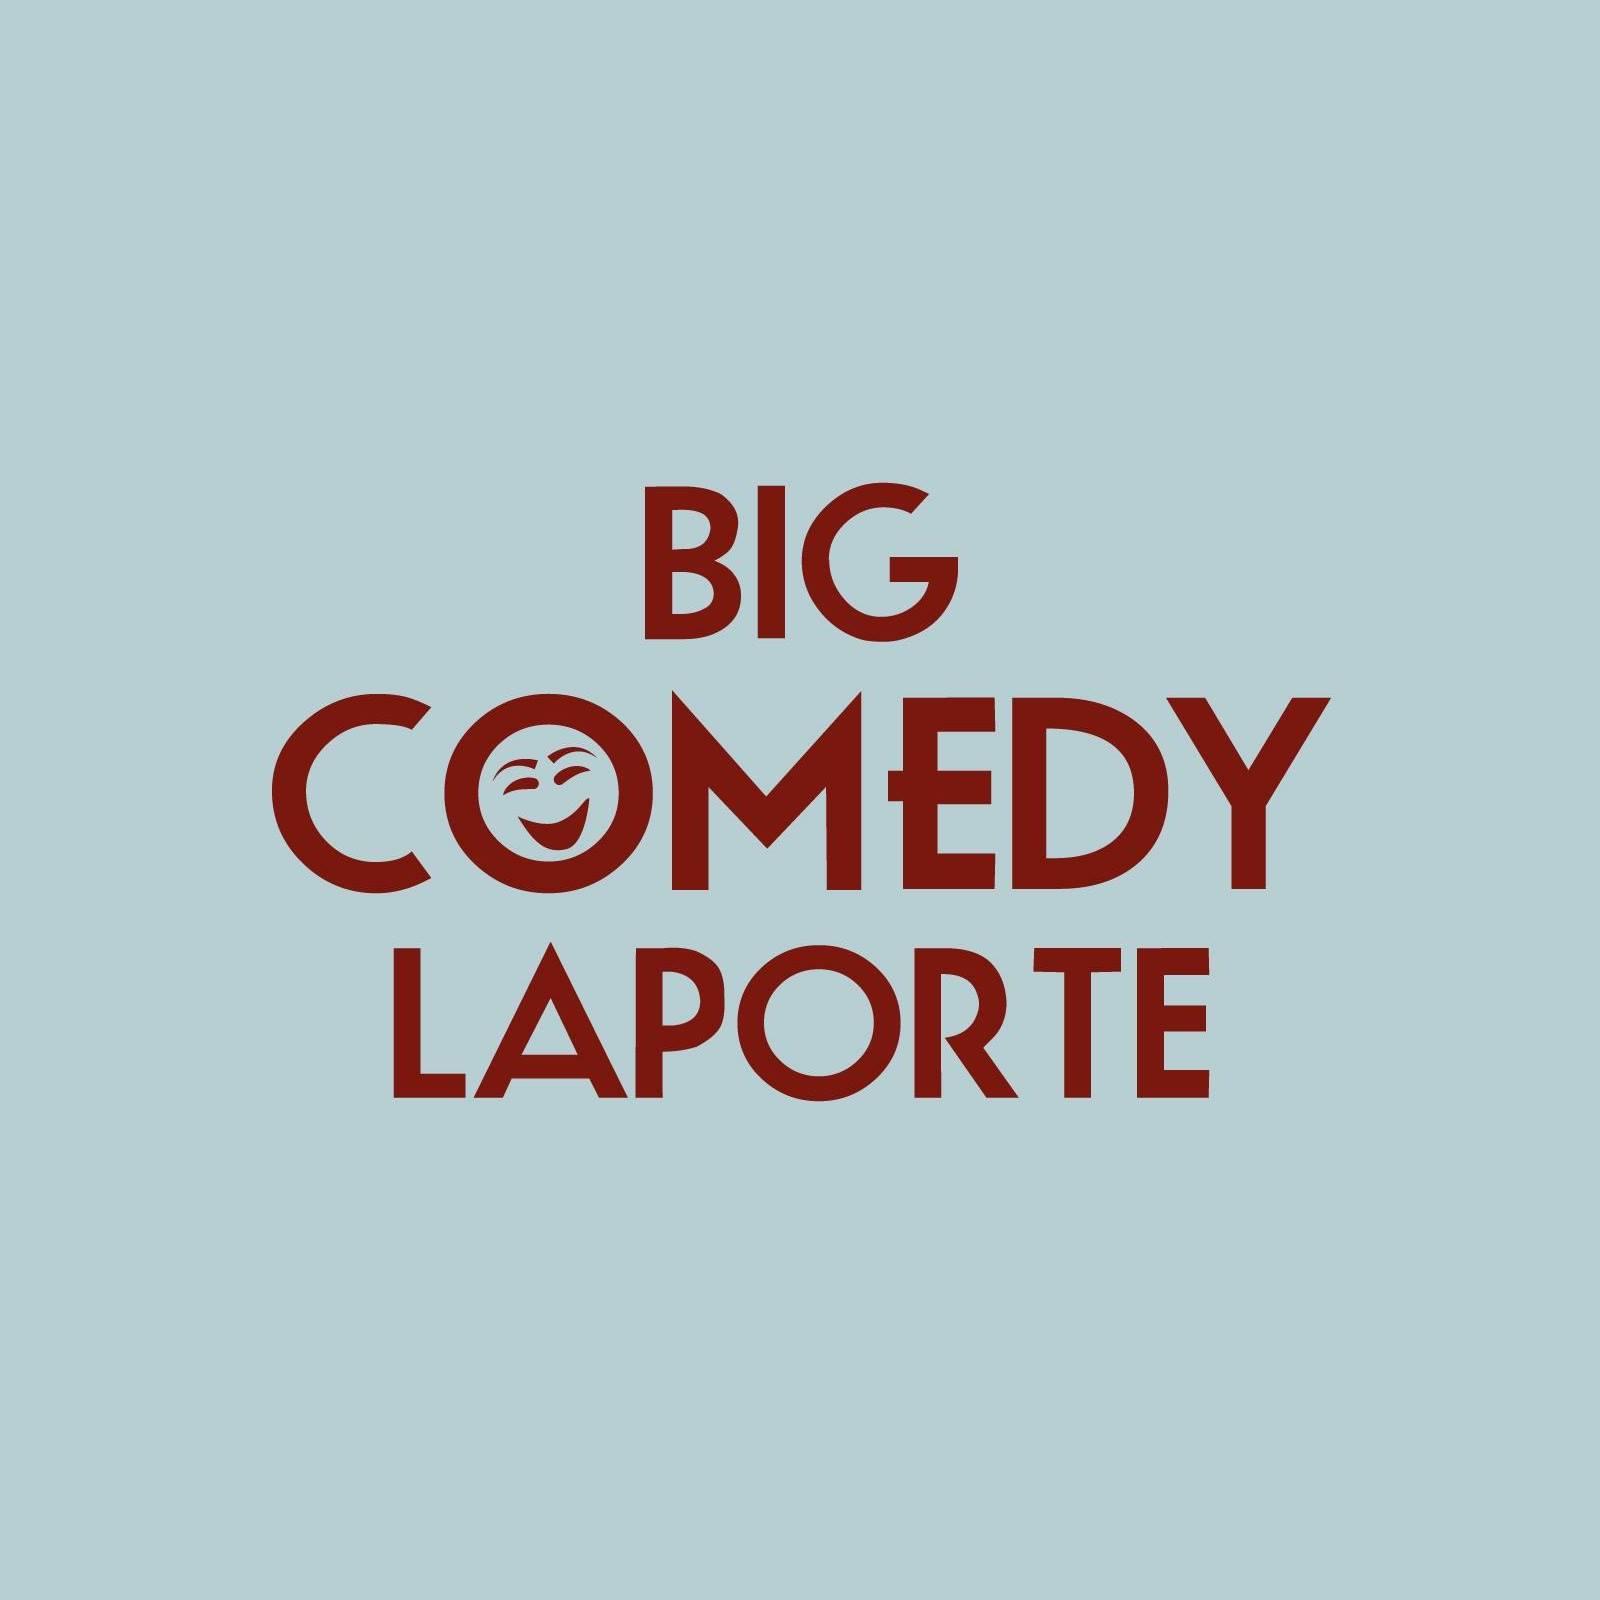 Big Comedy La Porte